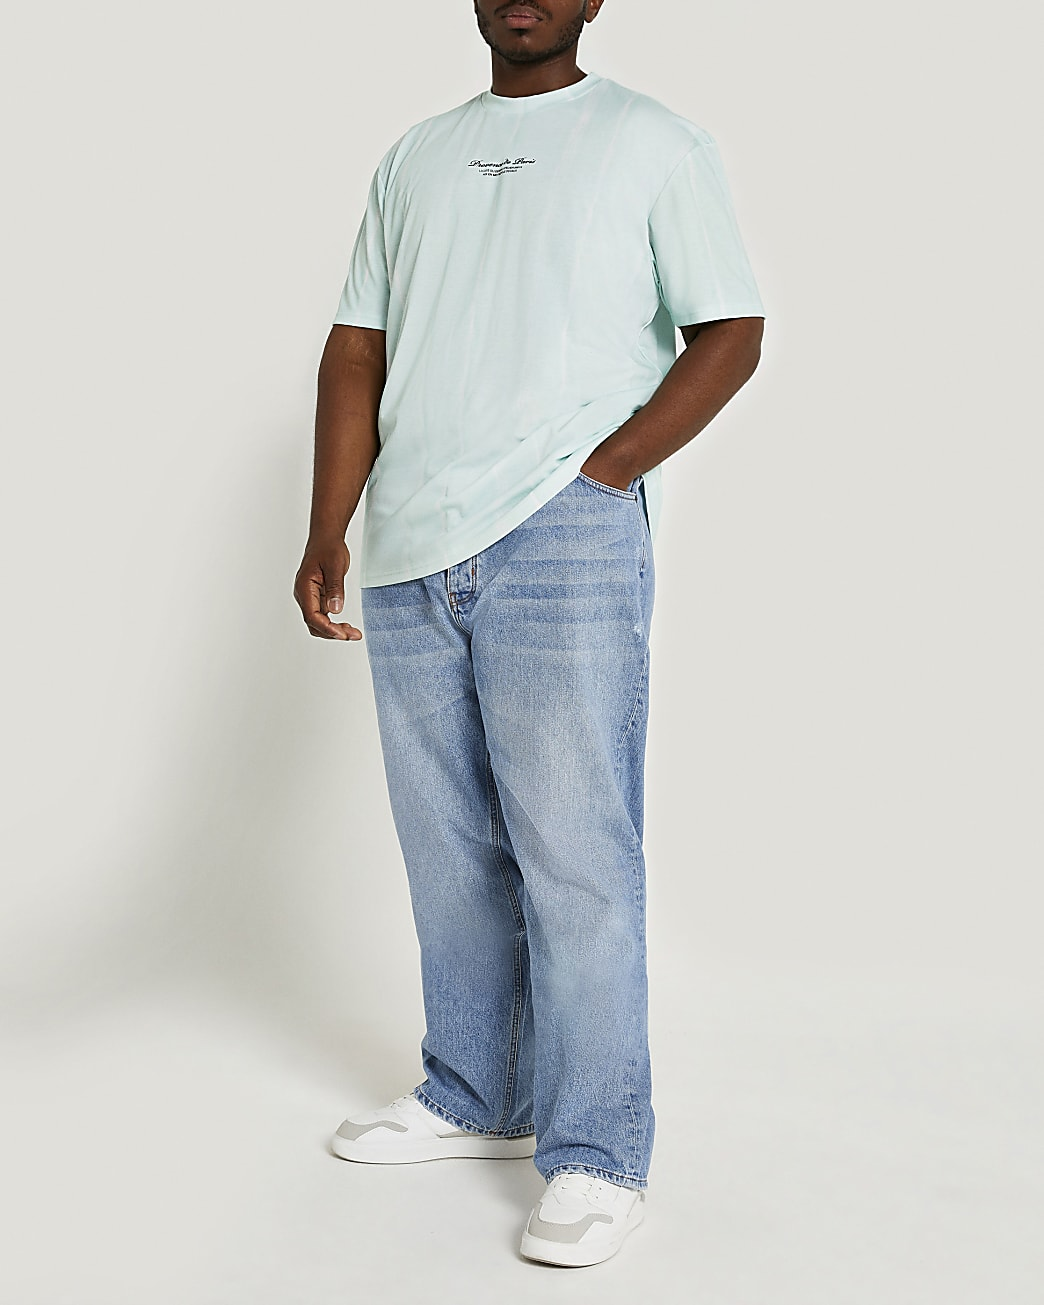 Big & Tall green stripe tie dye t-shirt